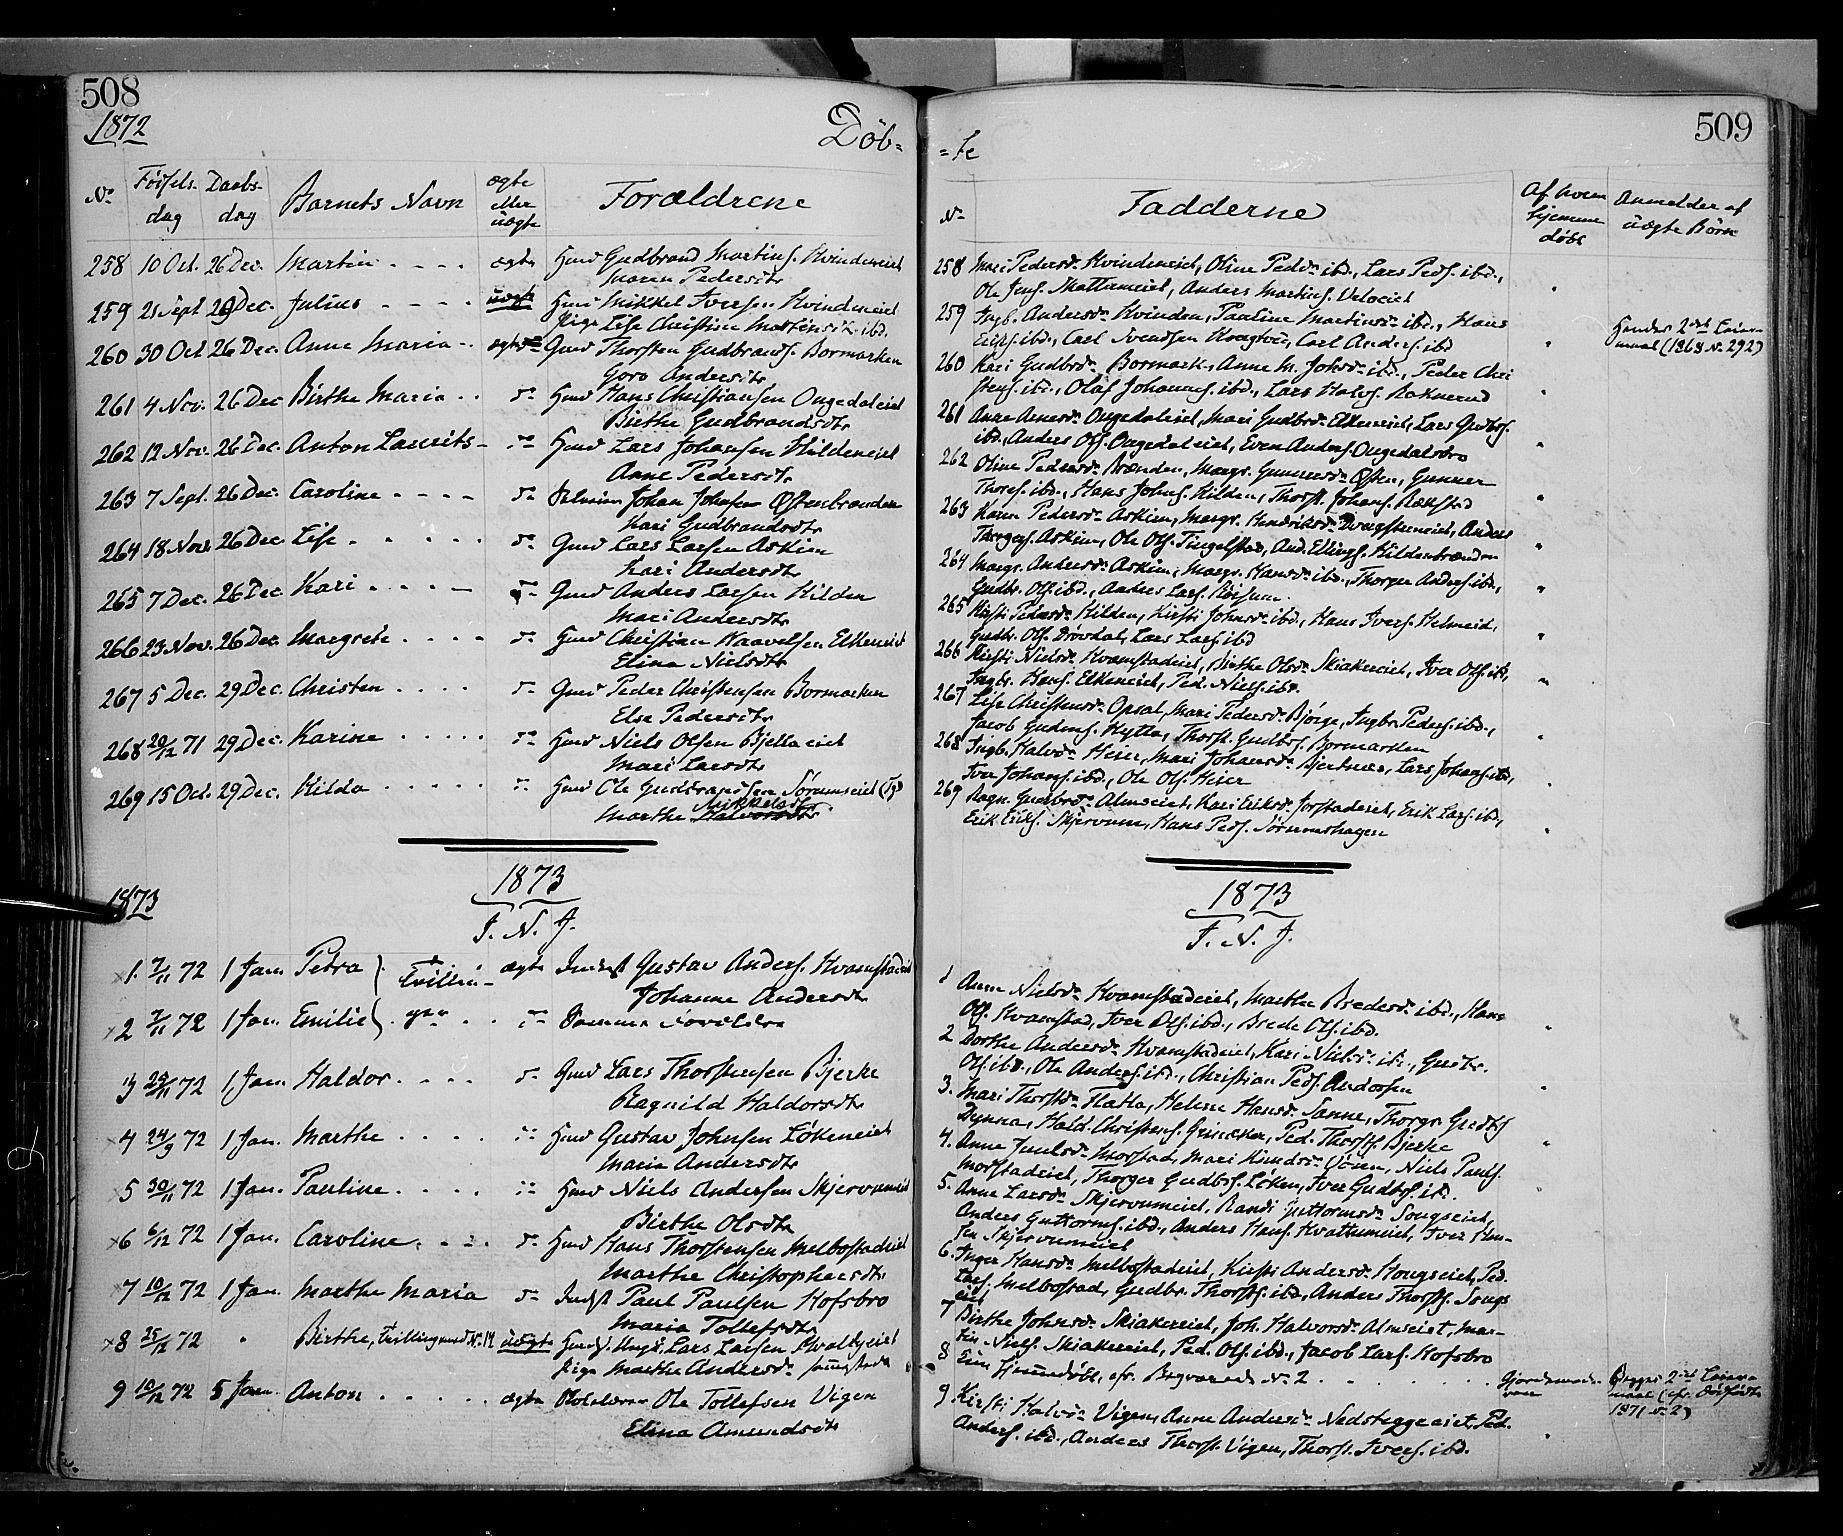 SAH, Gran prestekontor, Ministerialbok nr. 12, 1856-1874, s. 508-509